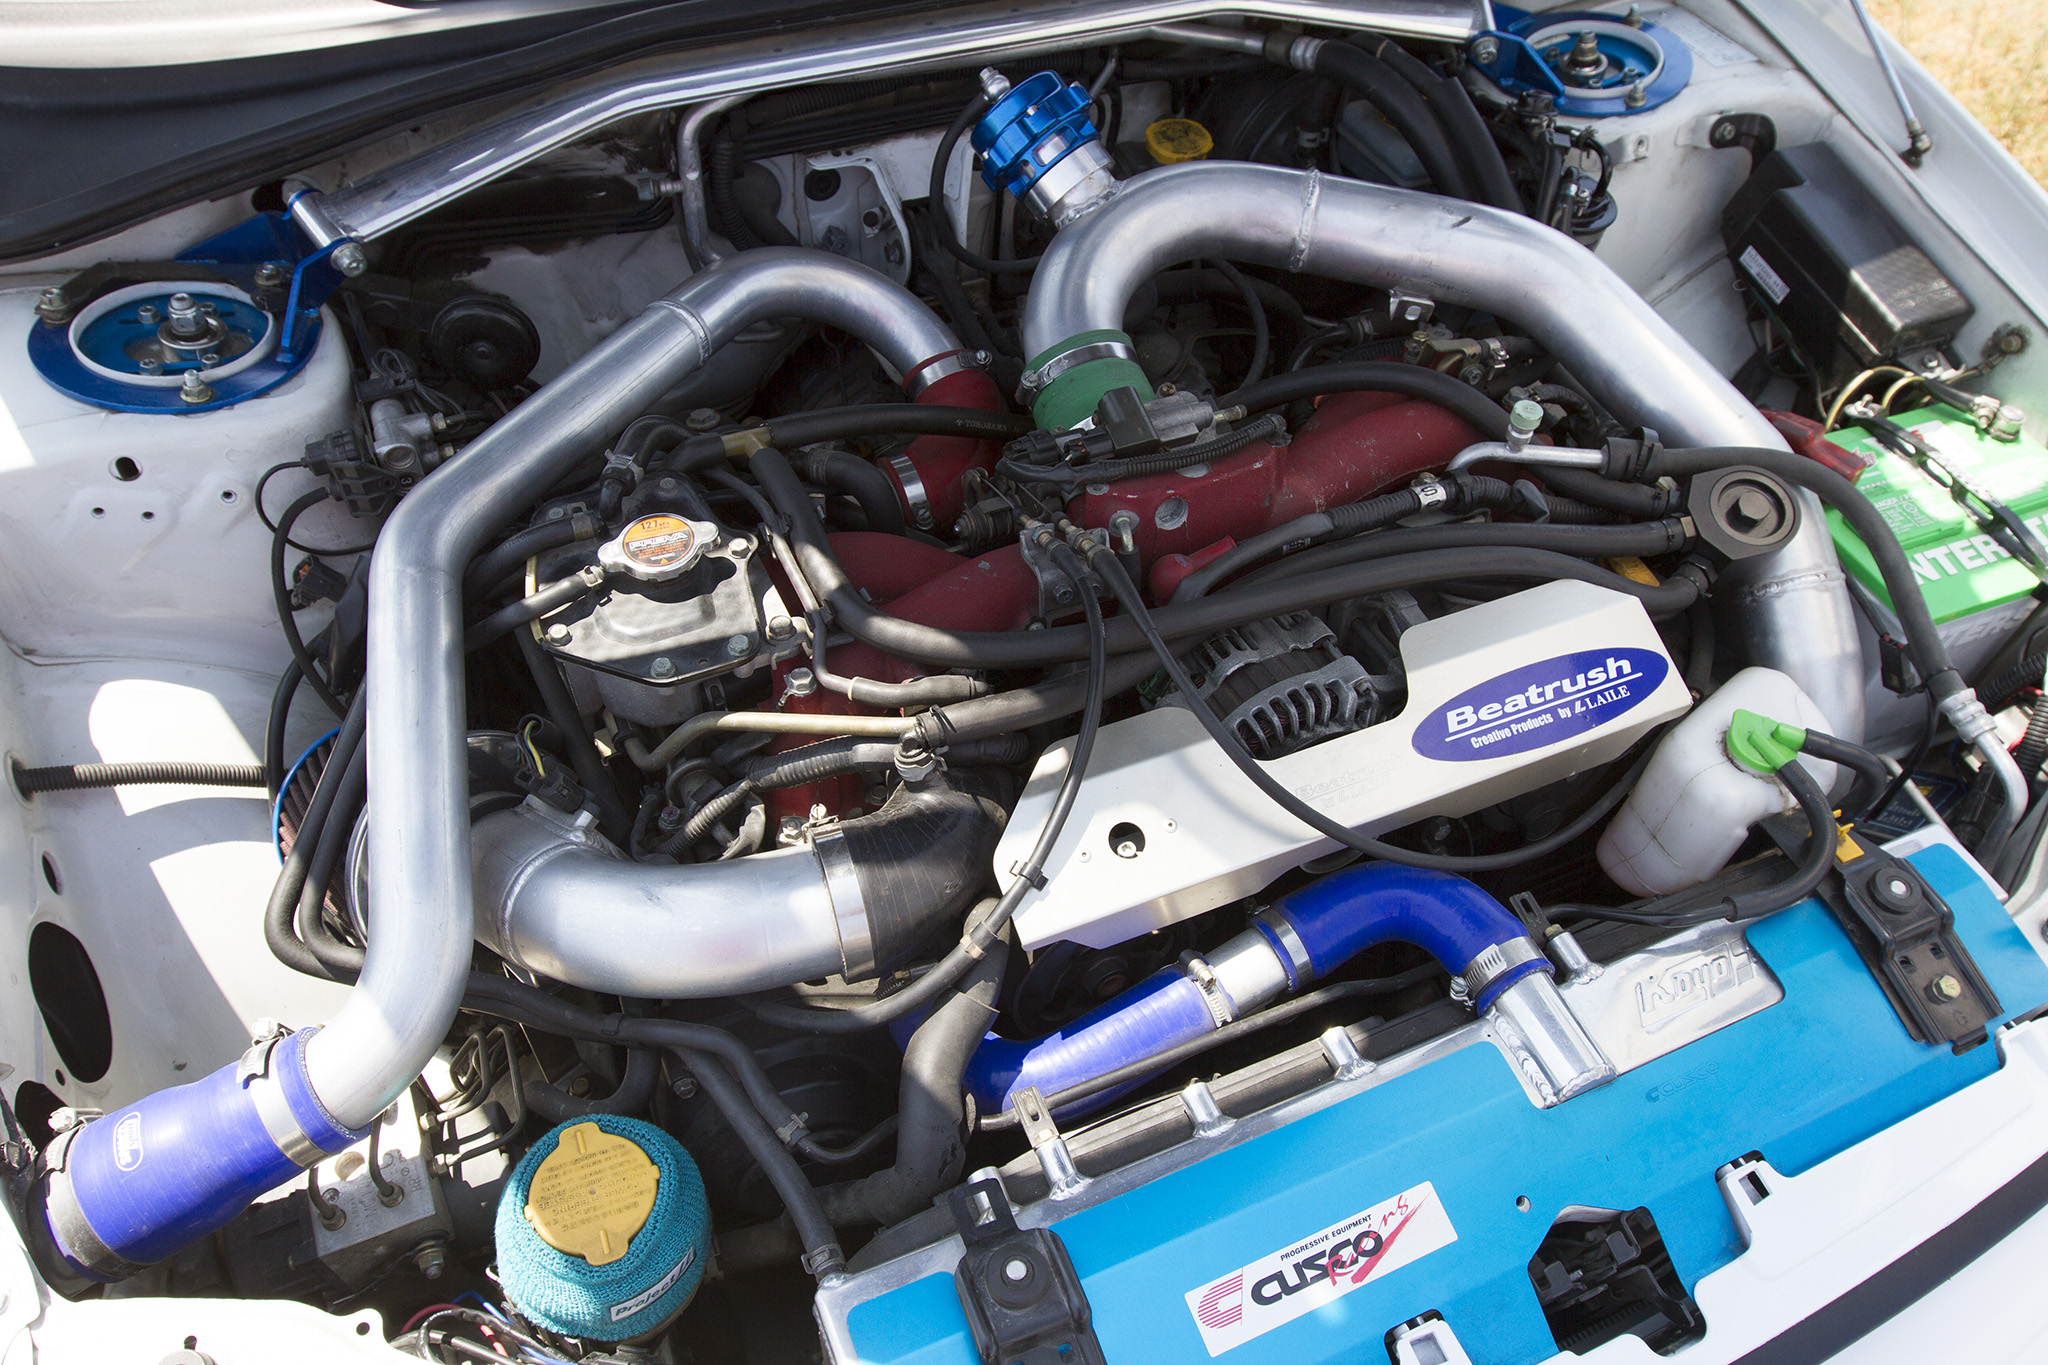 JDM EJ207 Swapped Subaru WRX - The Convert